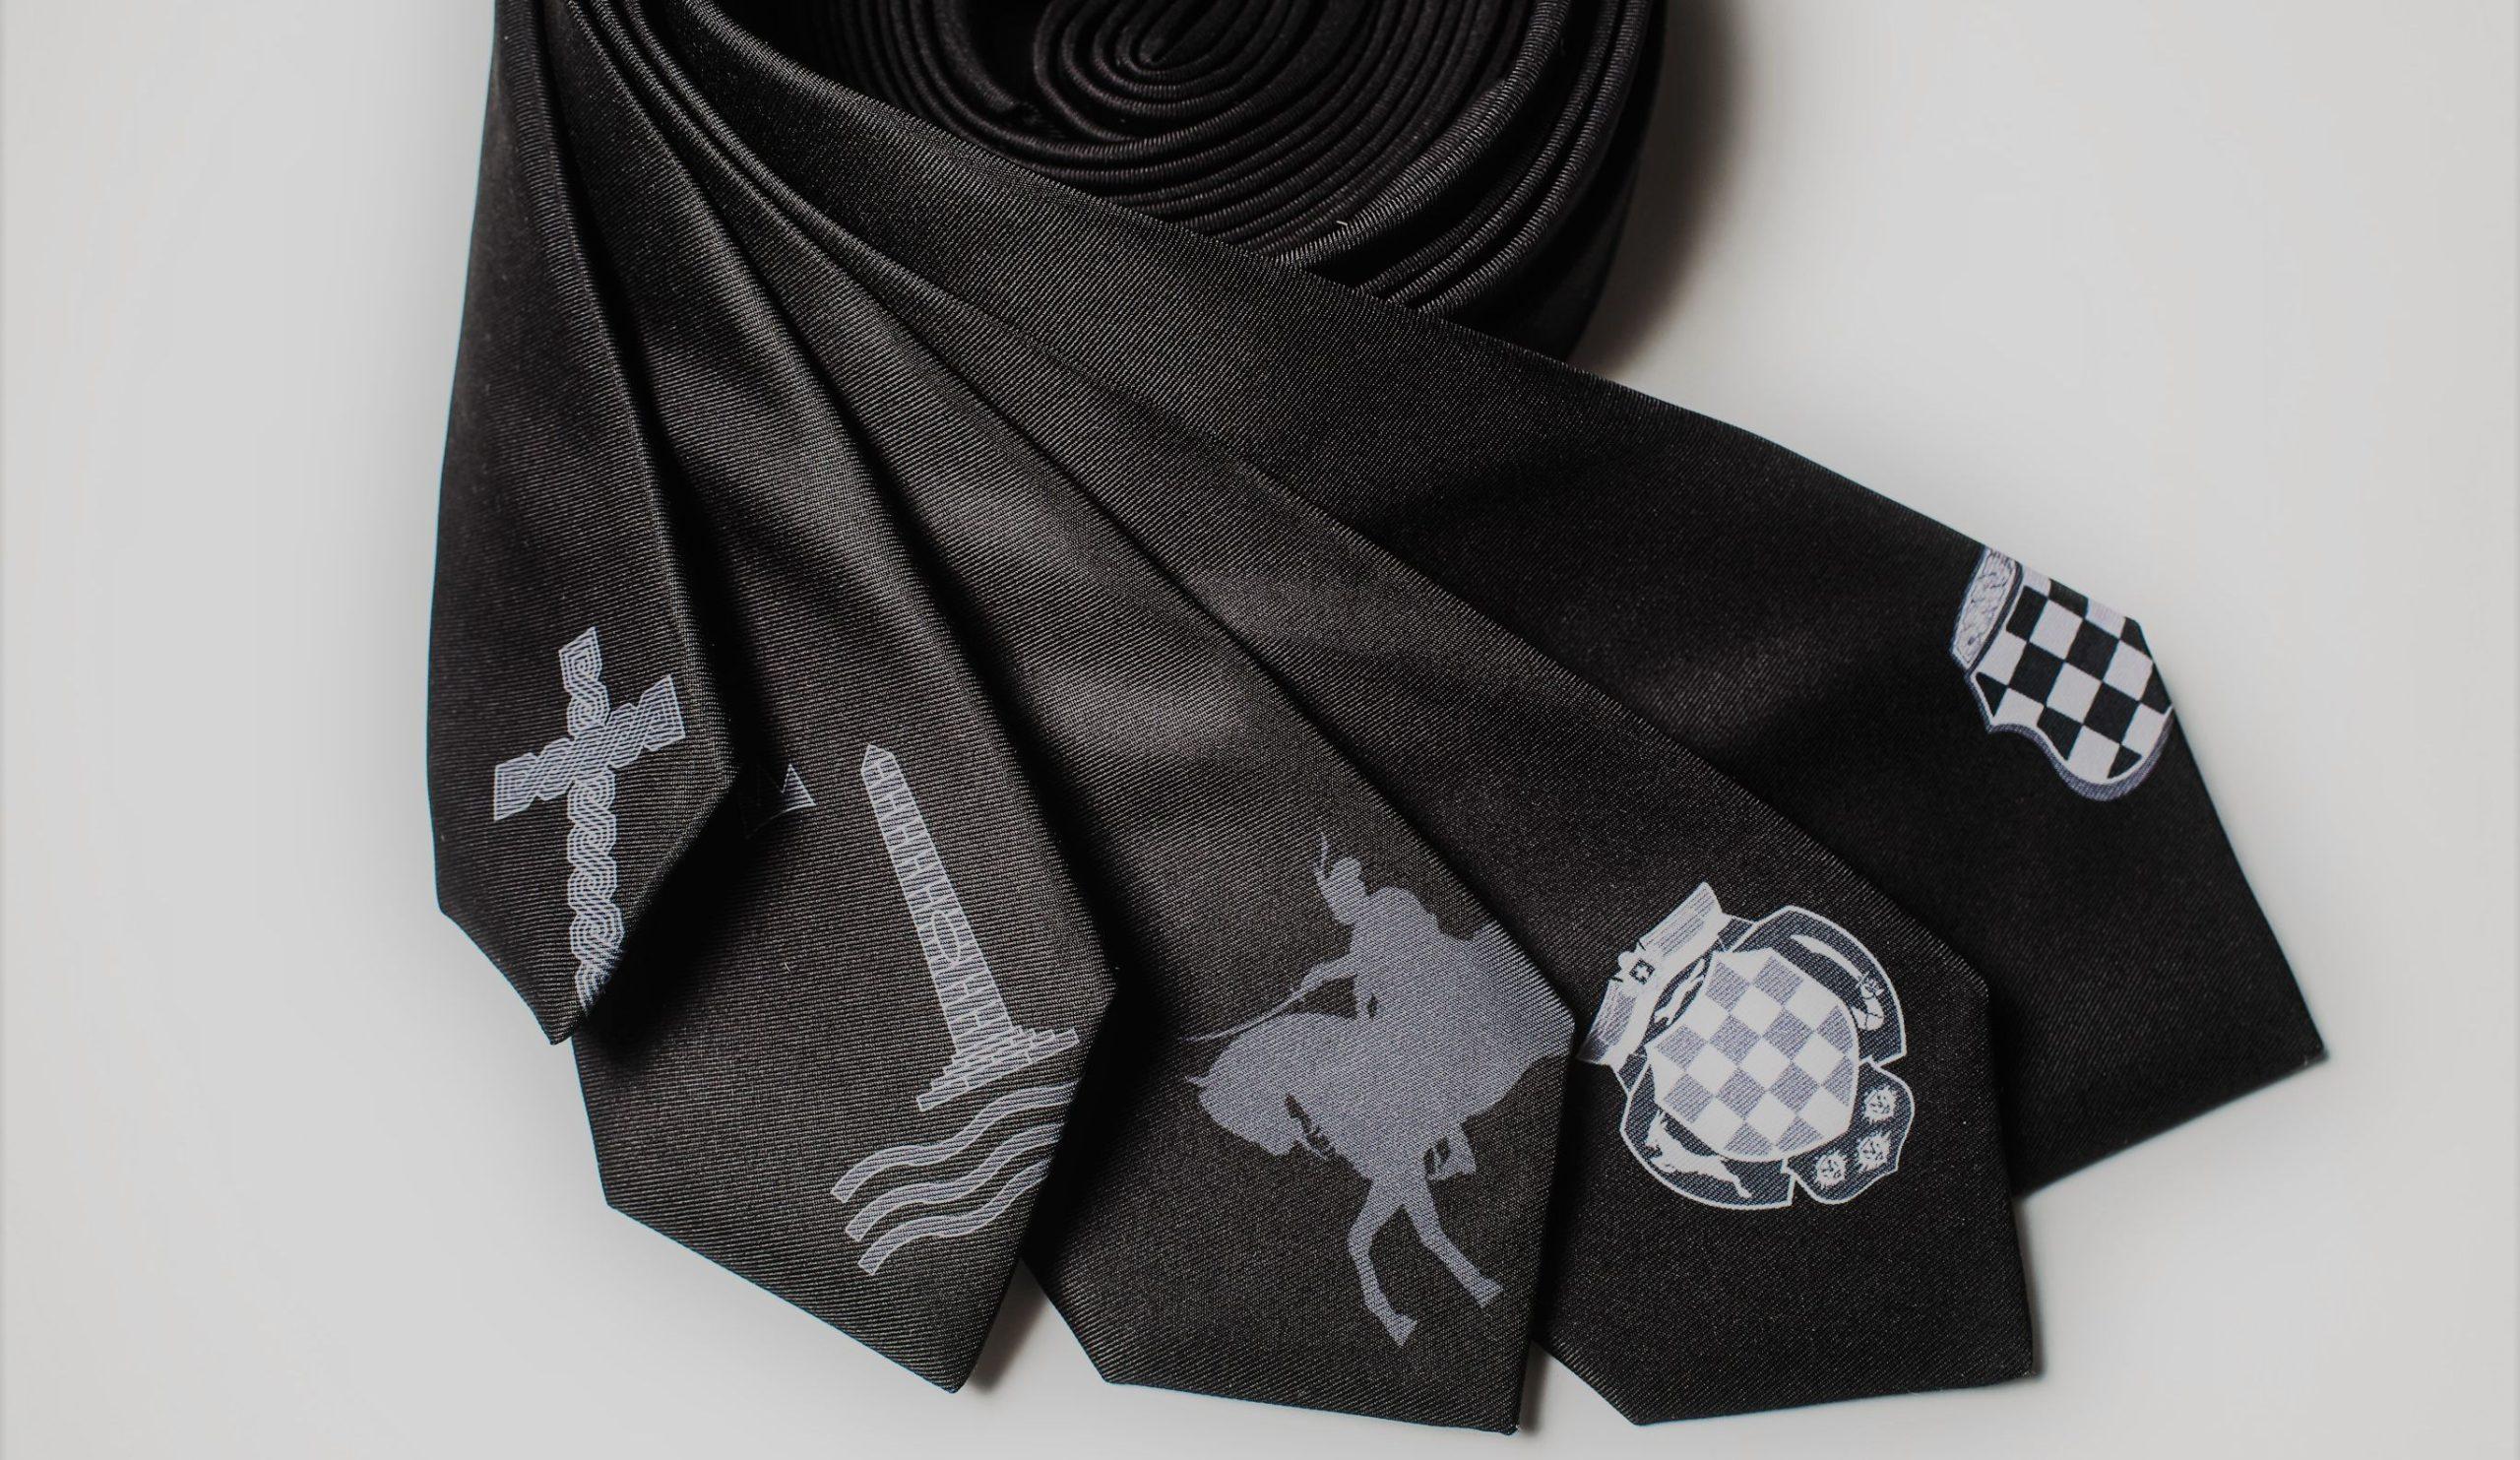 Canadian Clothing Brand Create Croatian Motif Ties